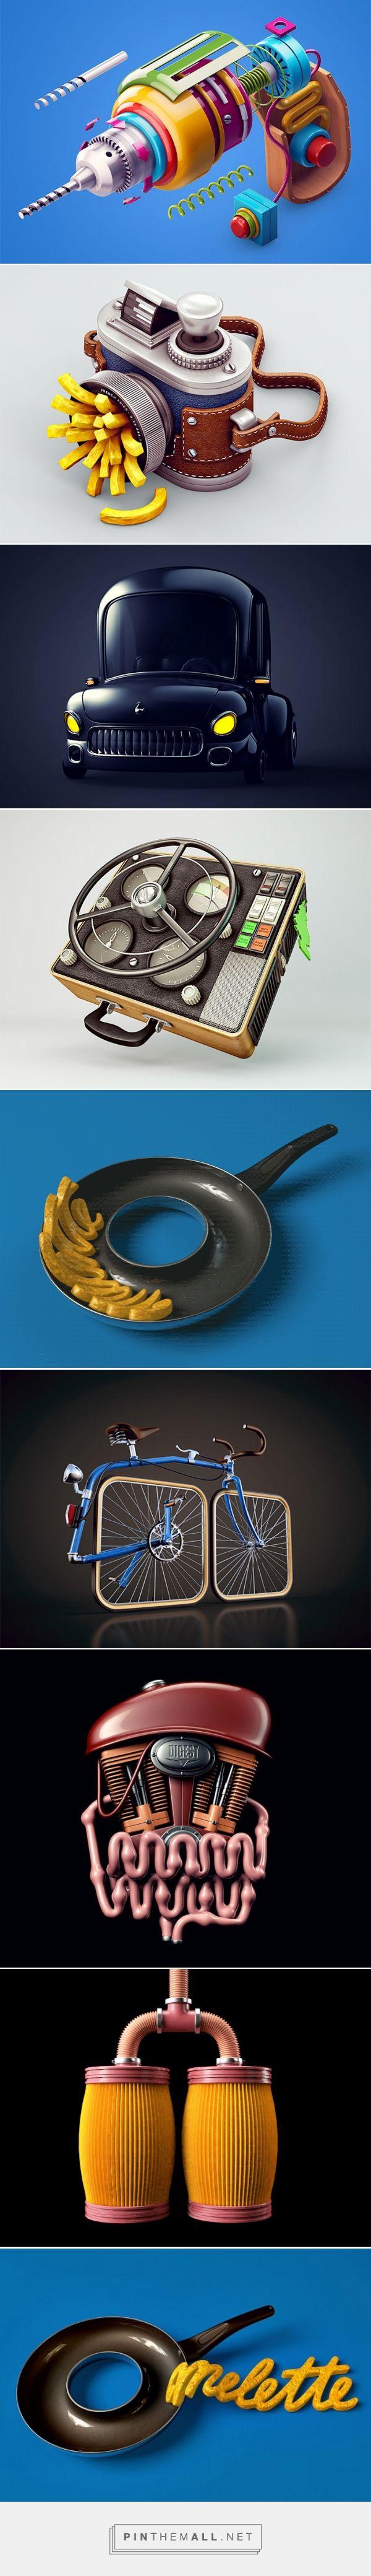 New 3D Artworks by Zhivko Terziivanov